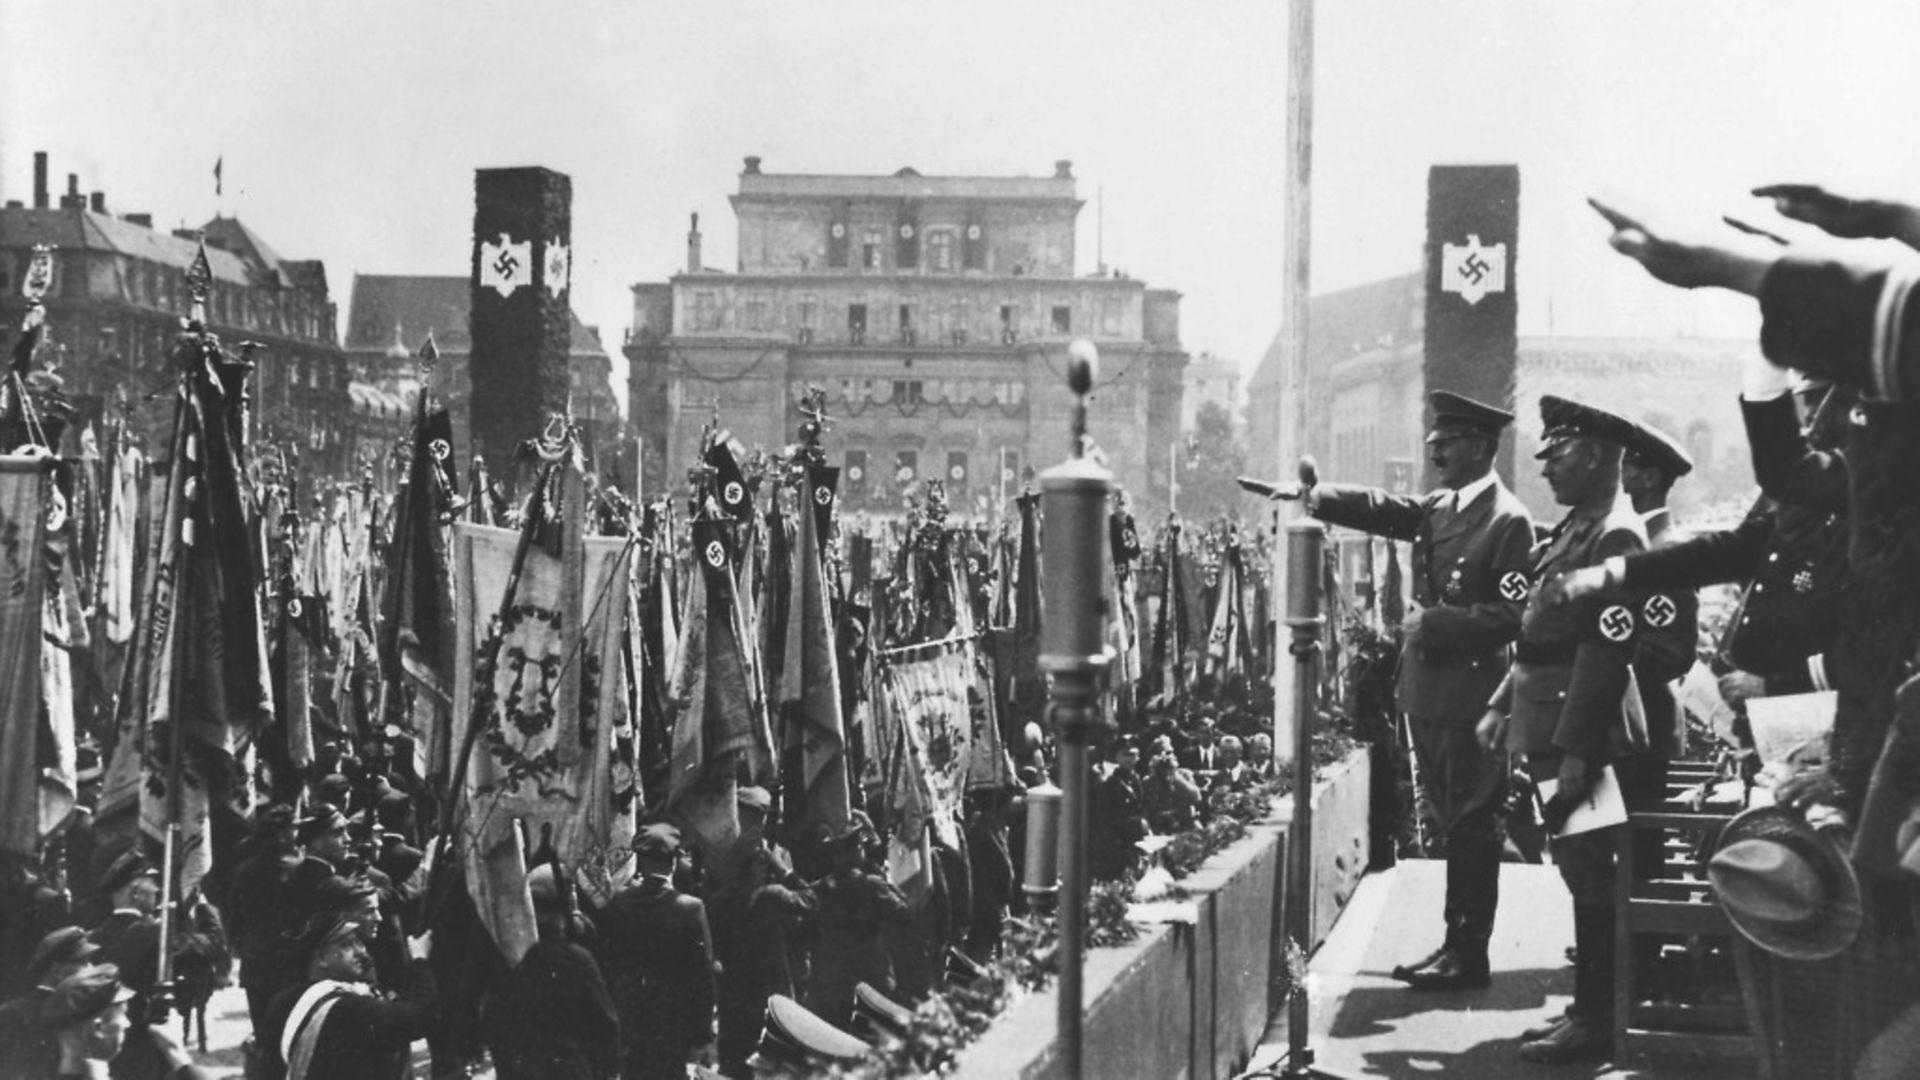 Adolf Hitler in 1938 Nazi Germany - Credit: ullstein bild via Getty Images